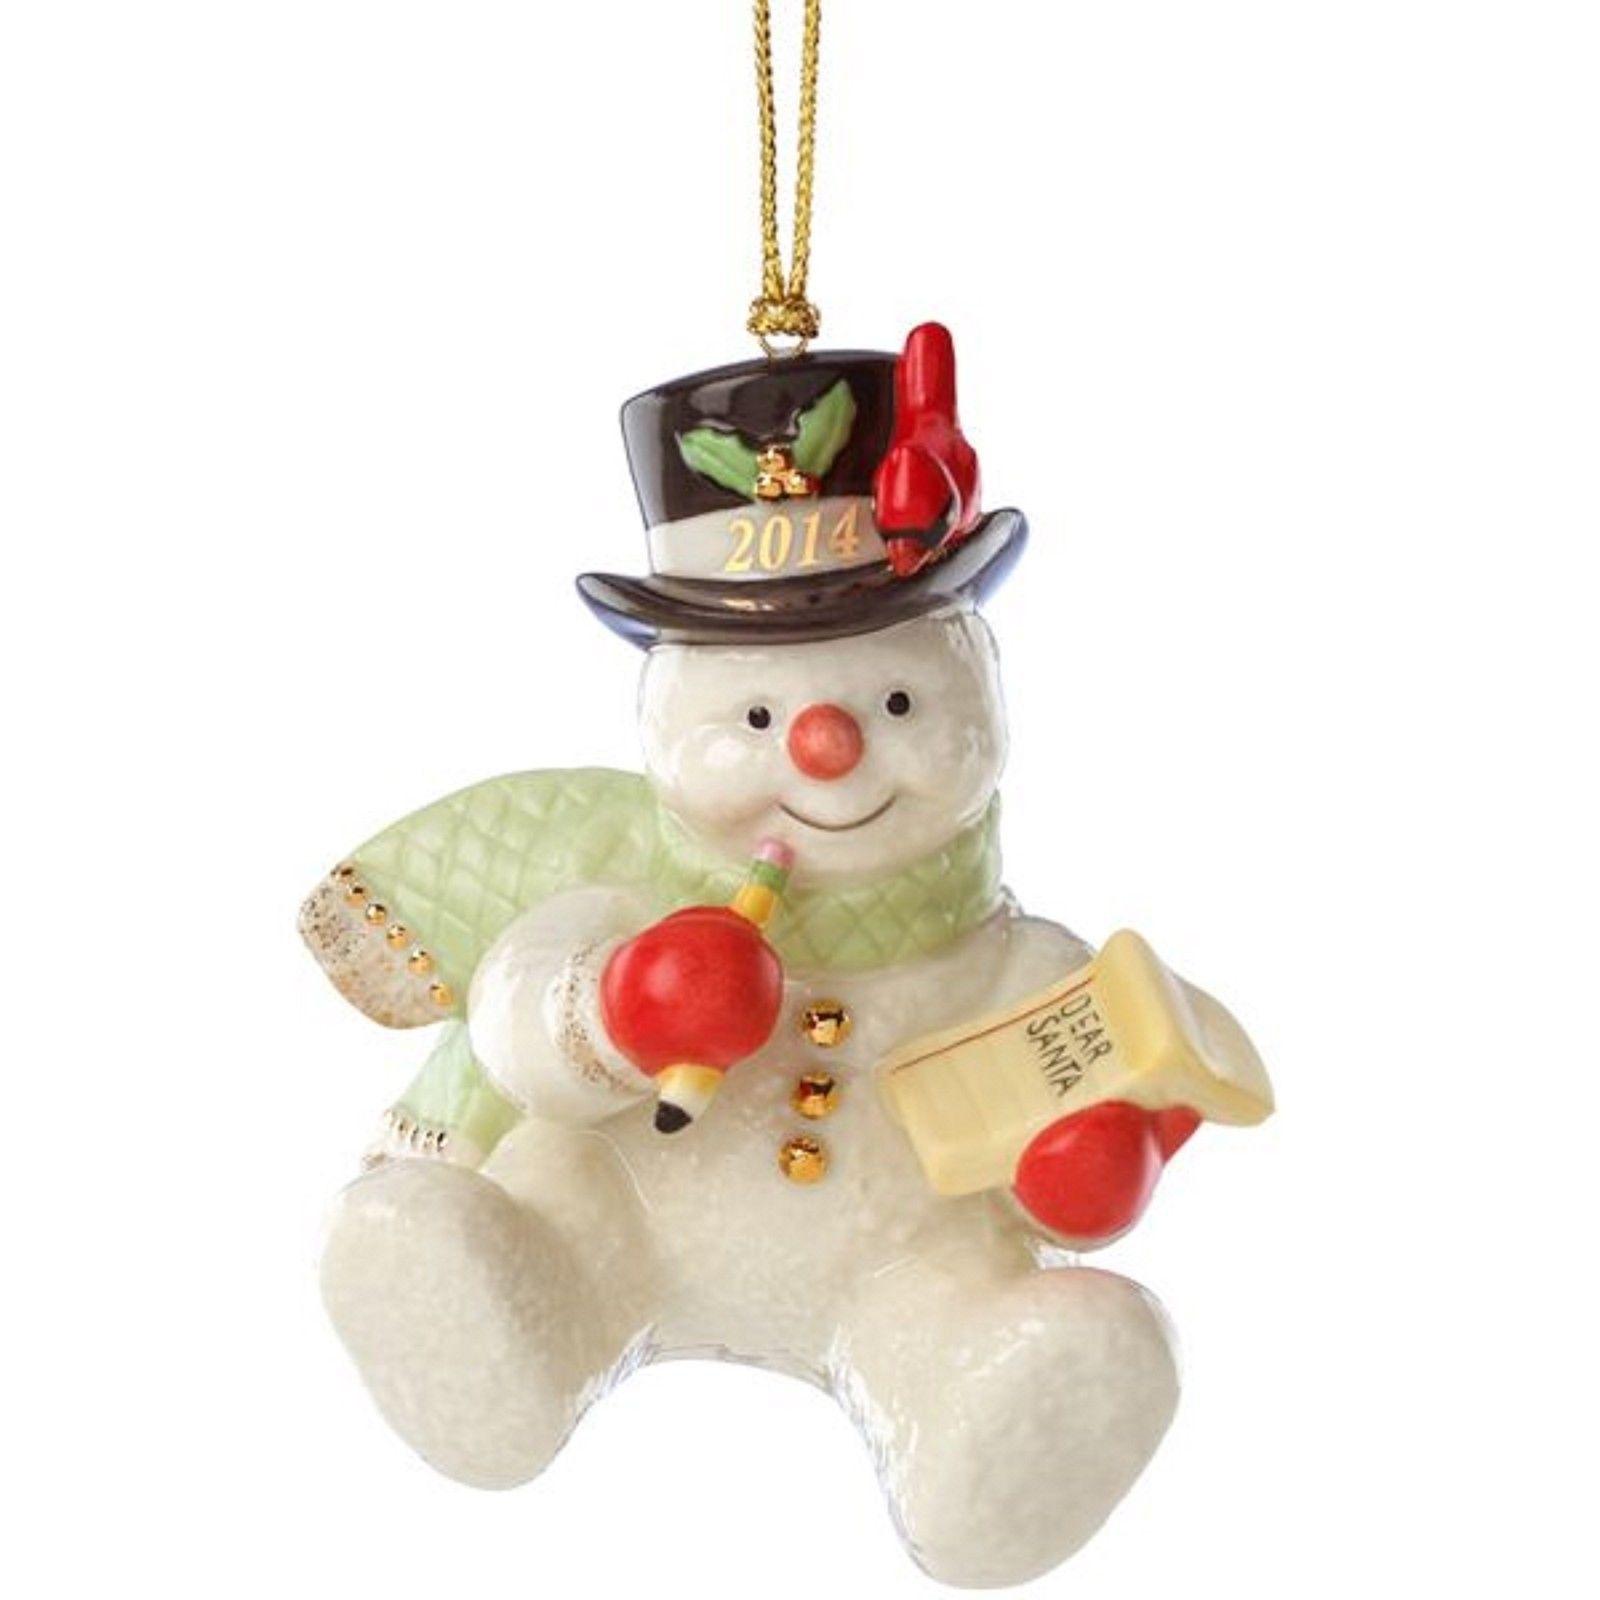 Lenox 2014 Snowman Figurine Ornament Annual Making List ...